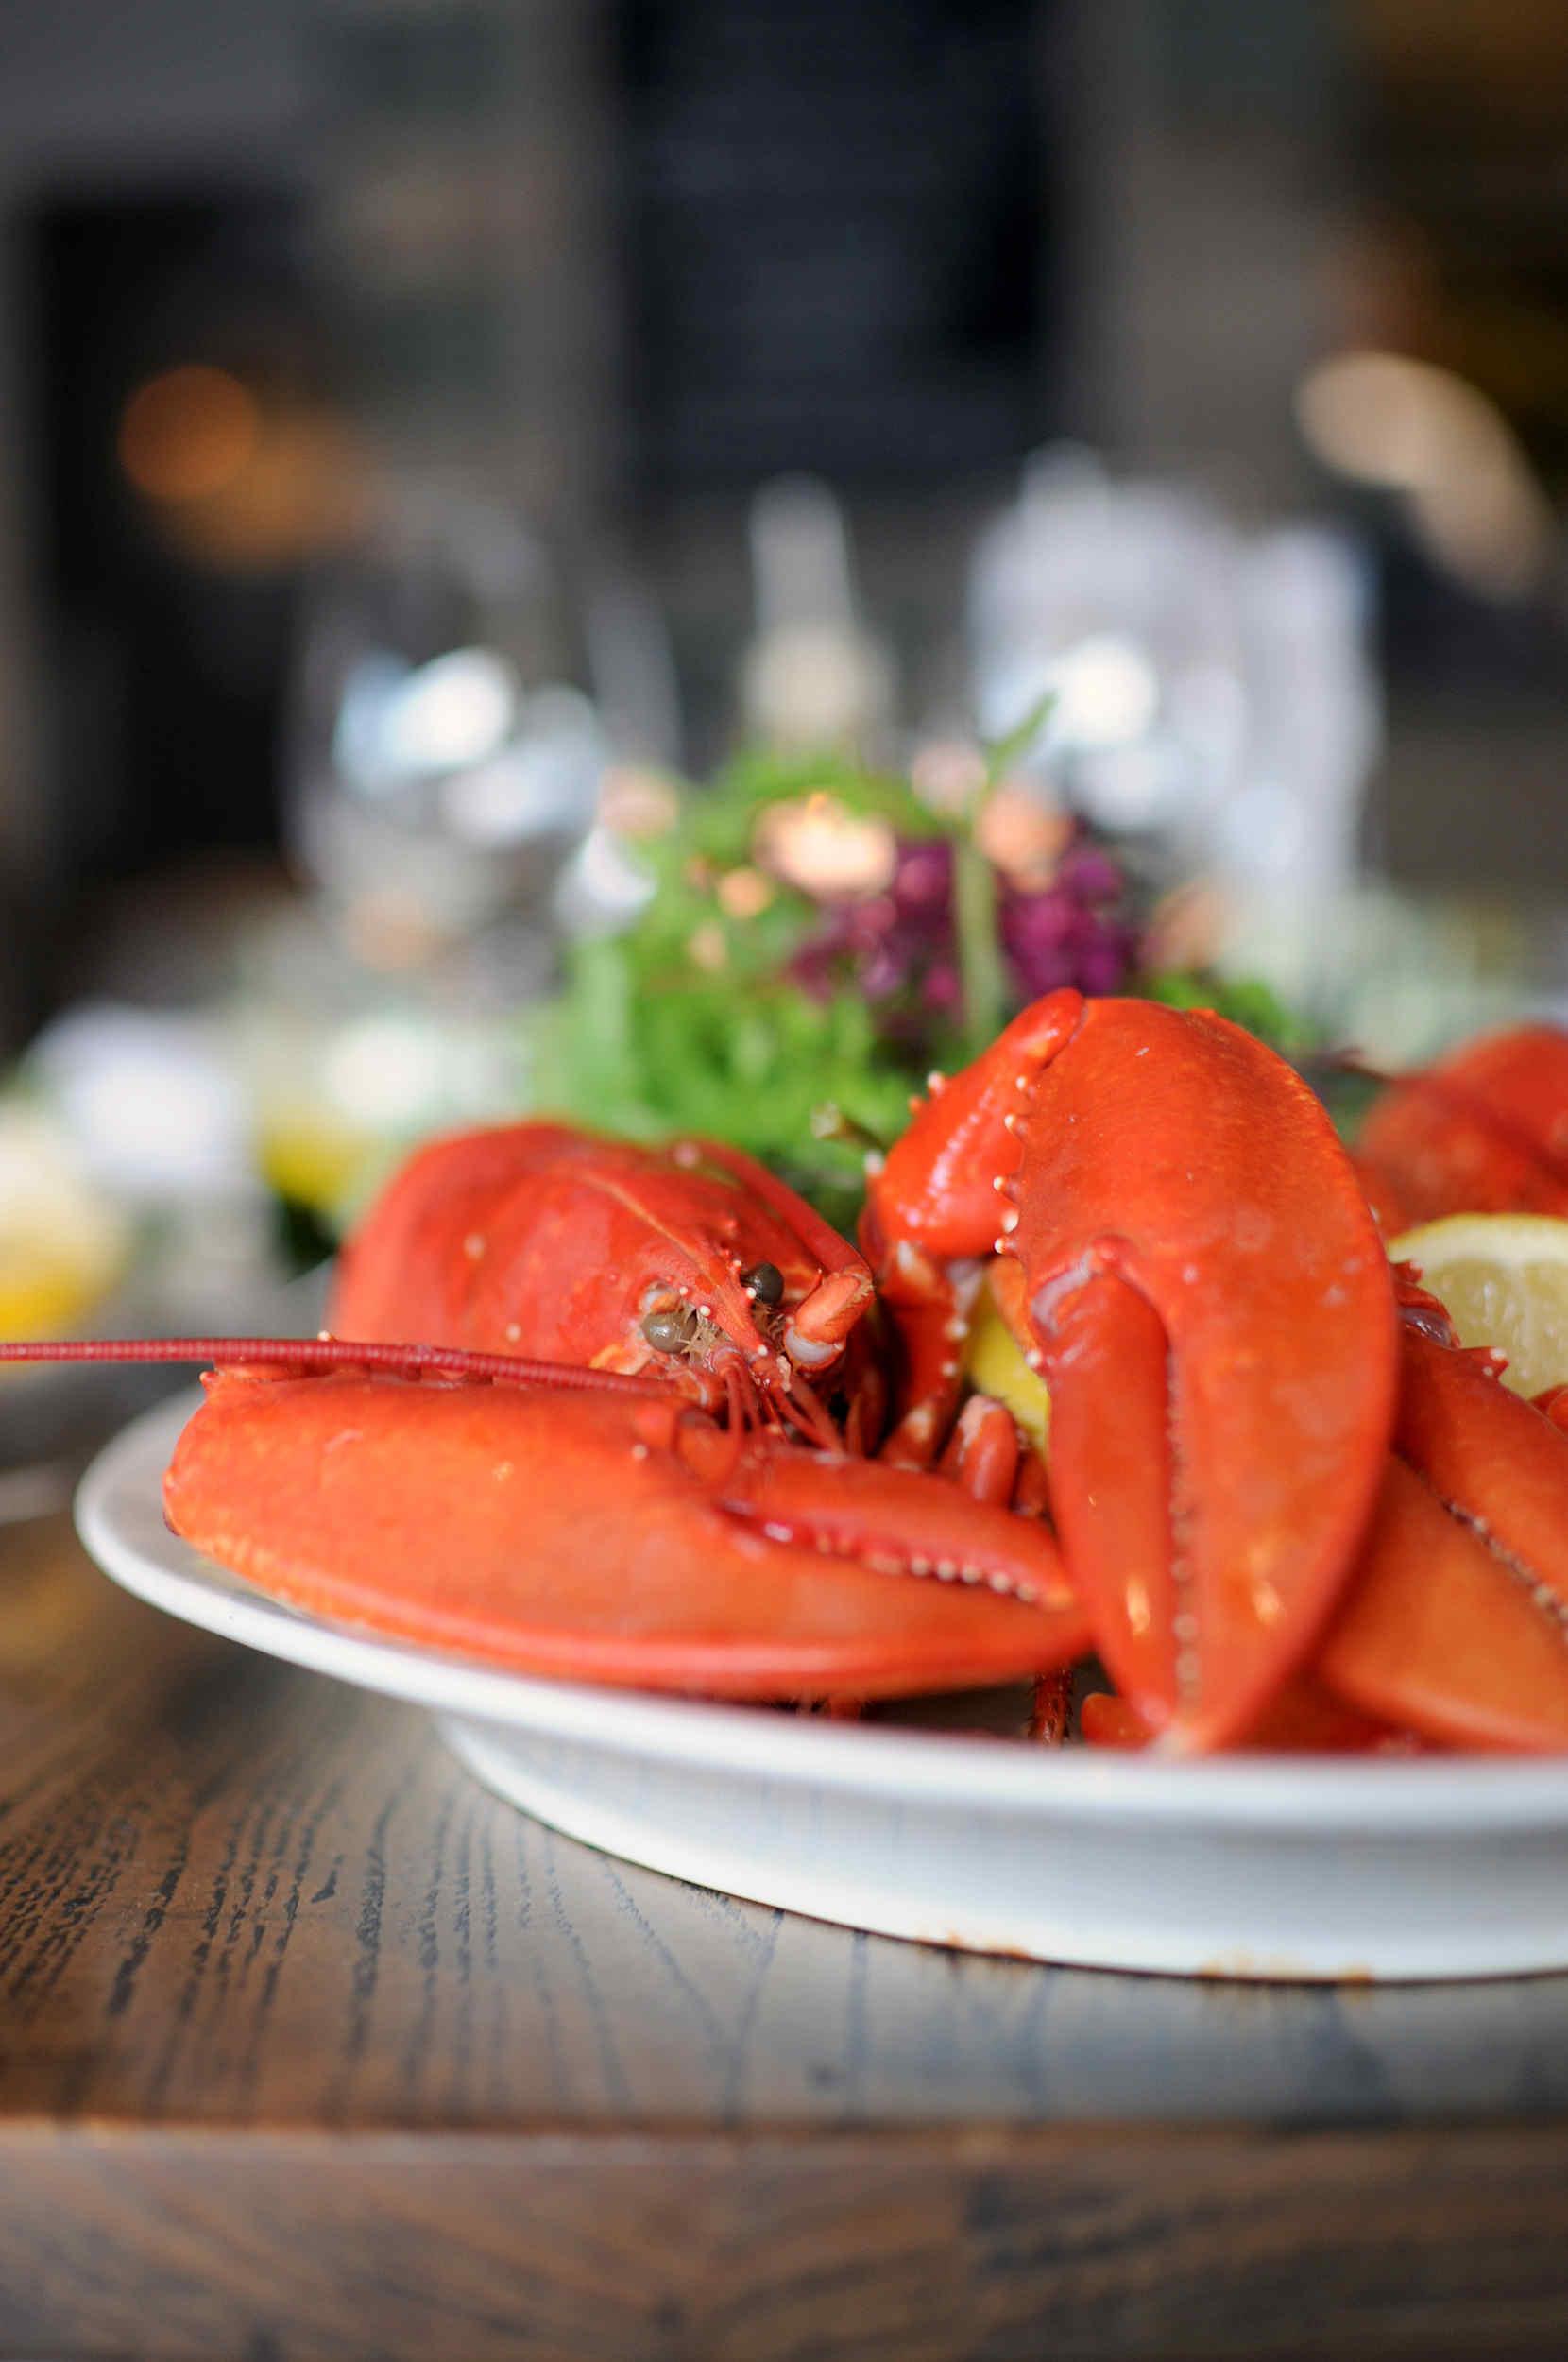 Seafood in Peel